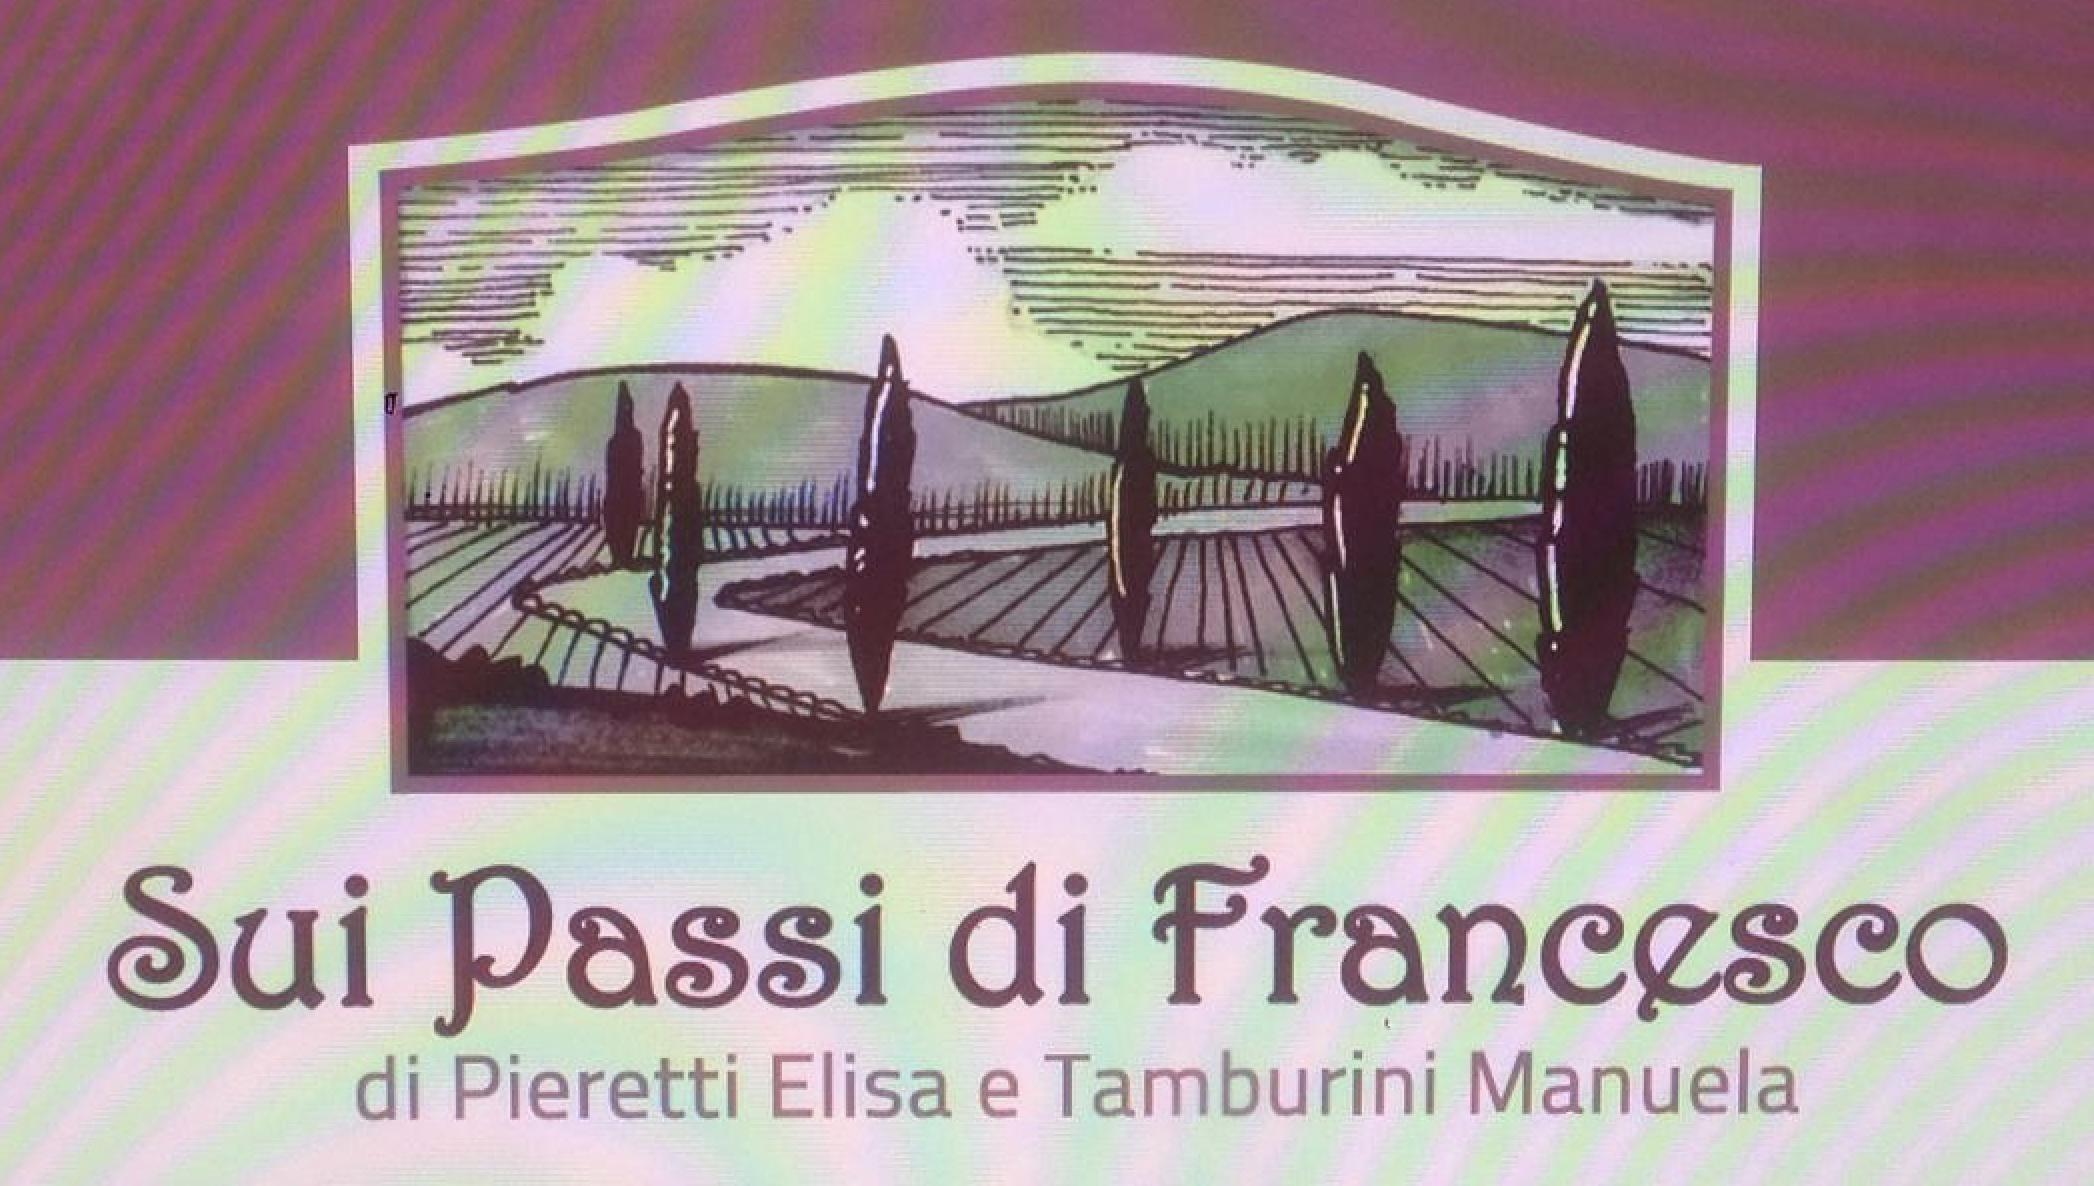 SUI PASSI DI FRANCESCO - Via Castellana, 21 - VALFABBRICA (Pg)Tel. +39 3466156189 - +39 3385824259www.suipassidifrancesco.it - suipassidifrancesco@tiscali.it